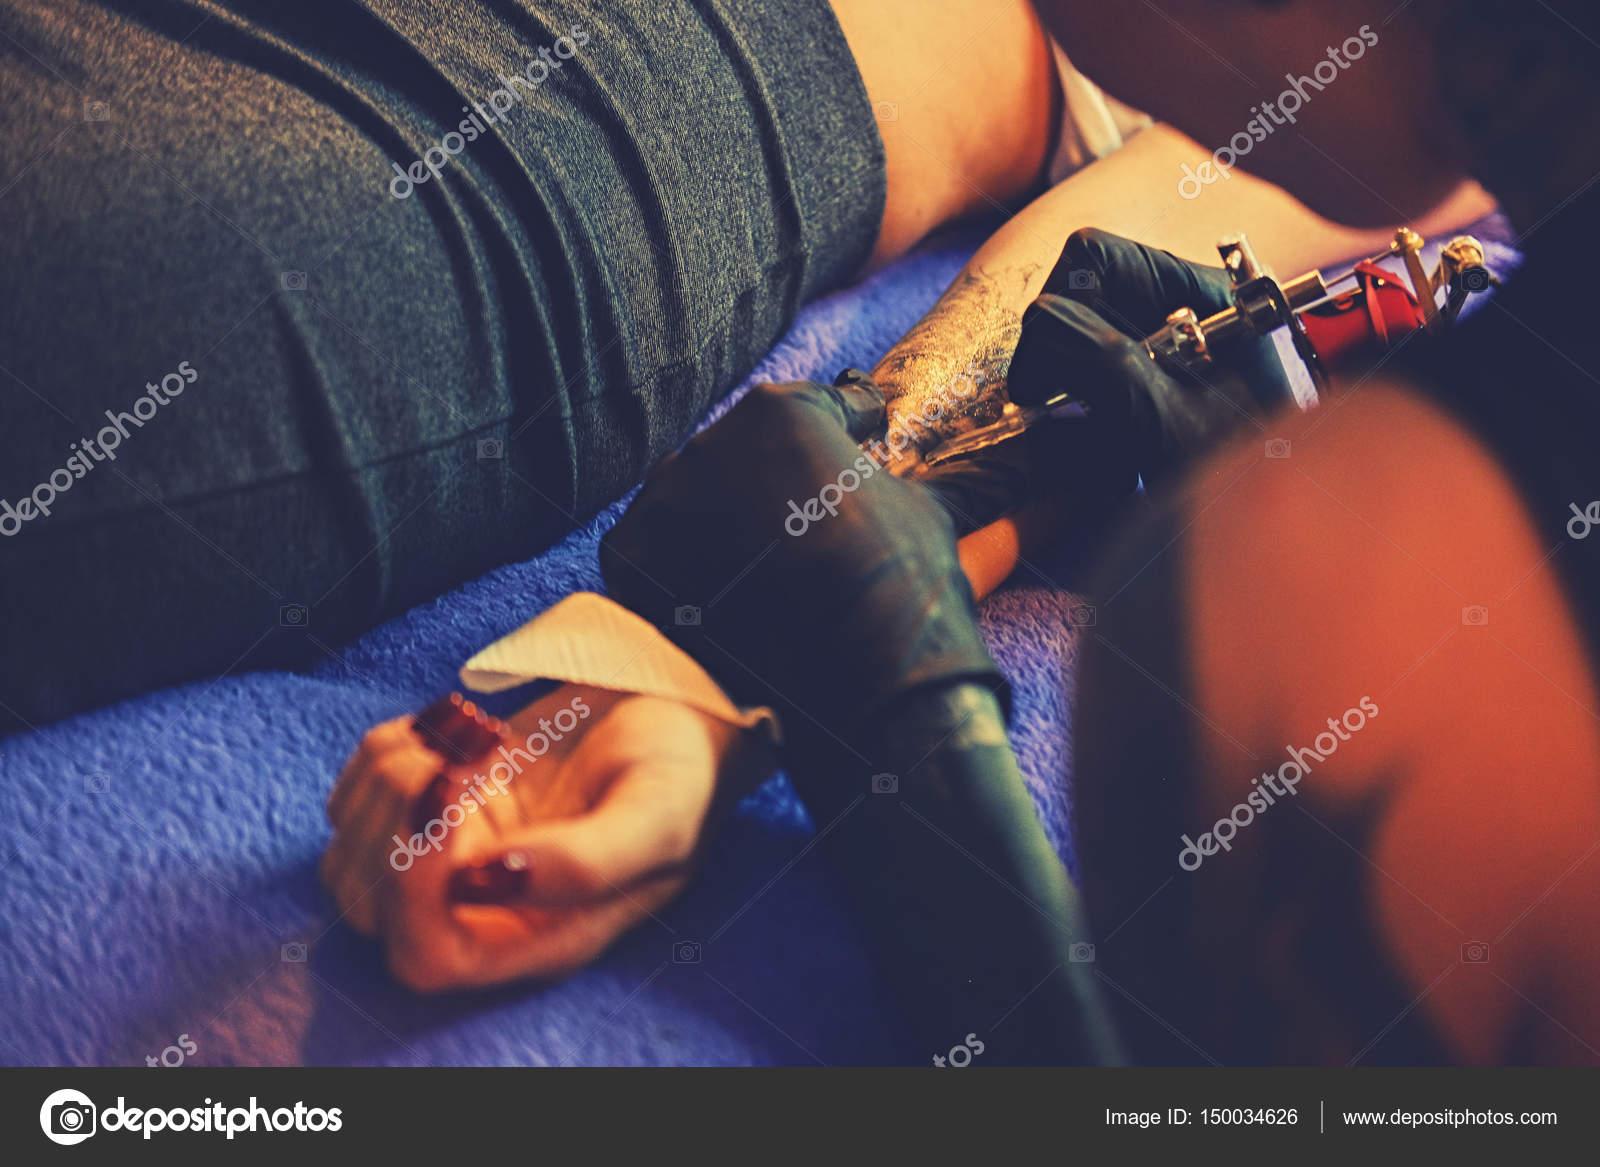 depositphotos_150034626-stock-photo-making-a-tattoo-on-a.jpg